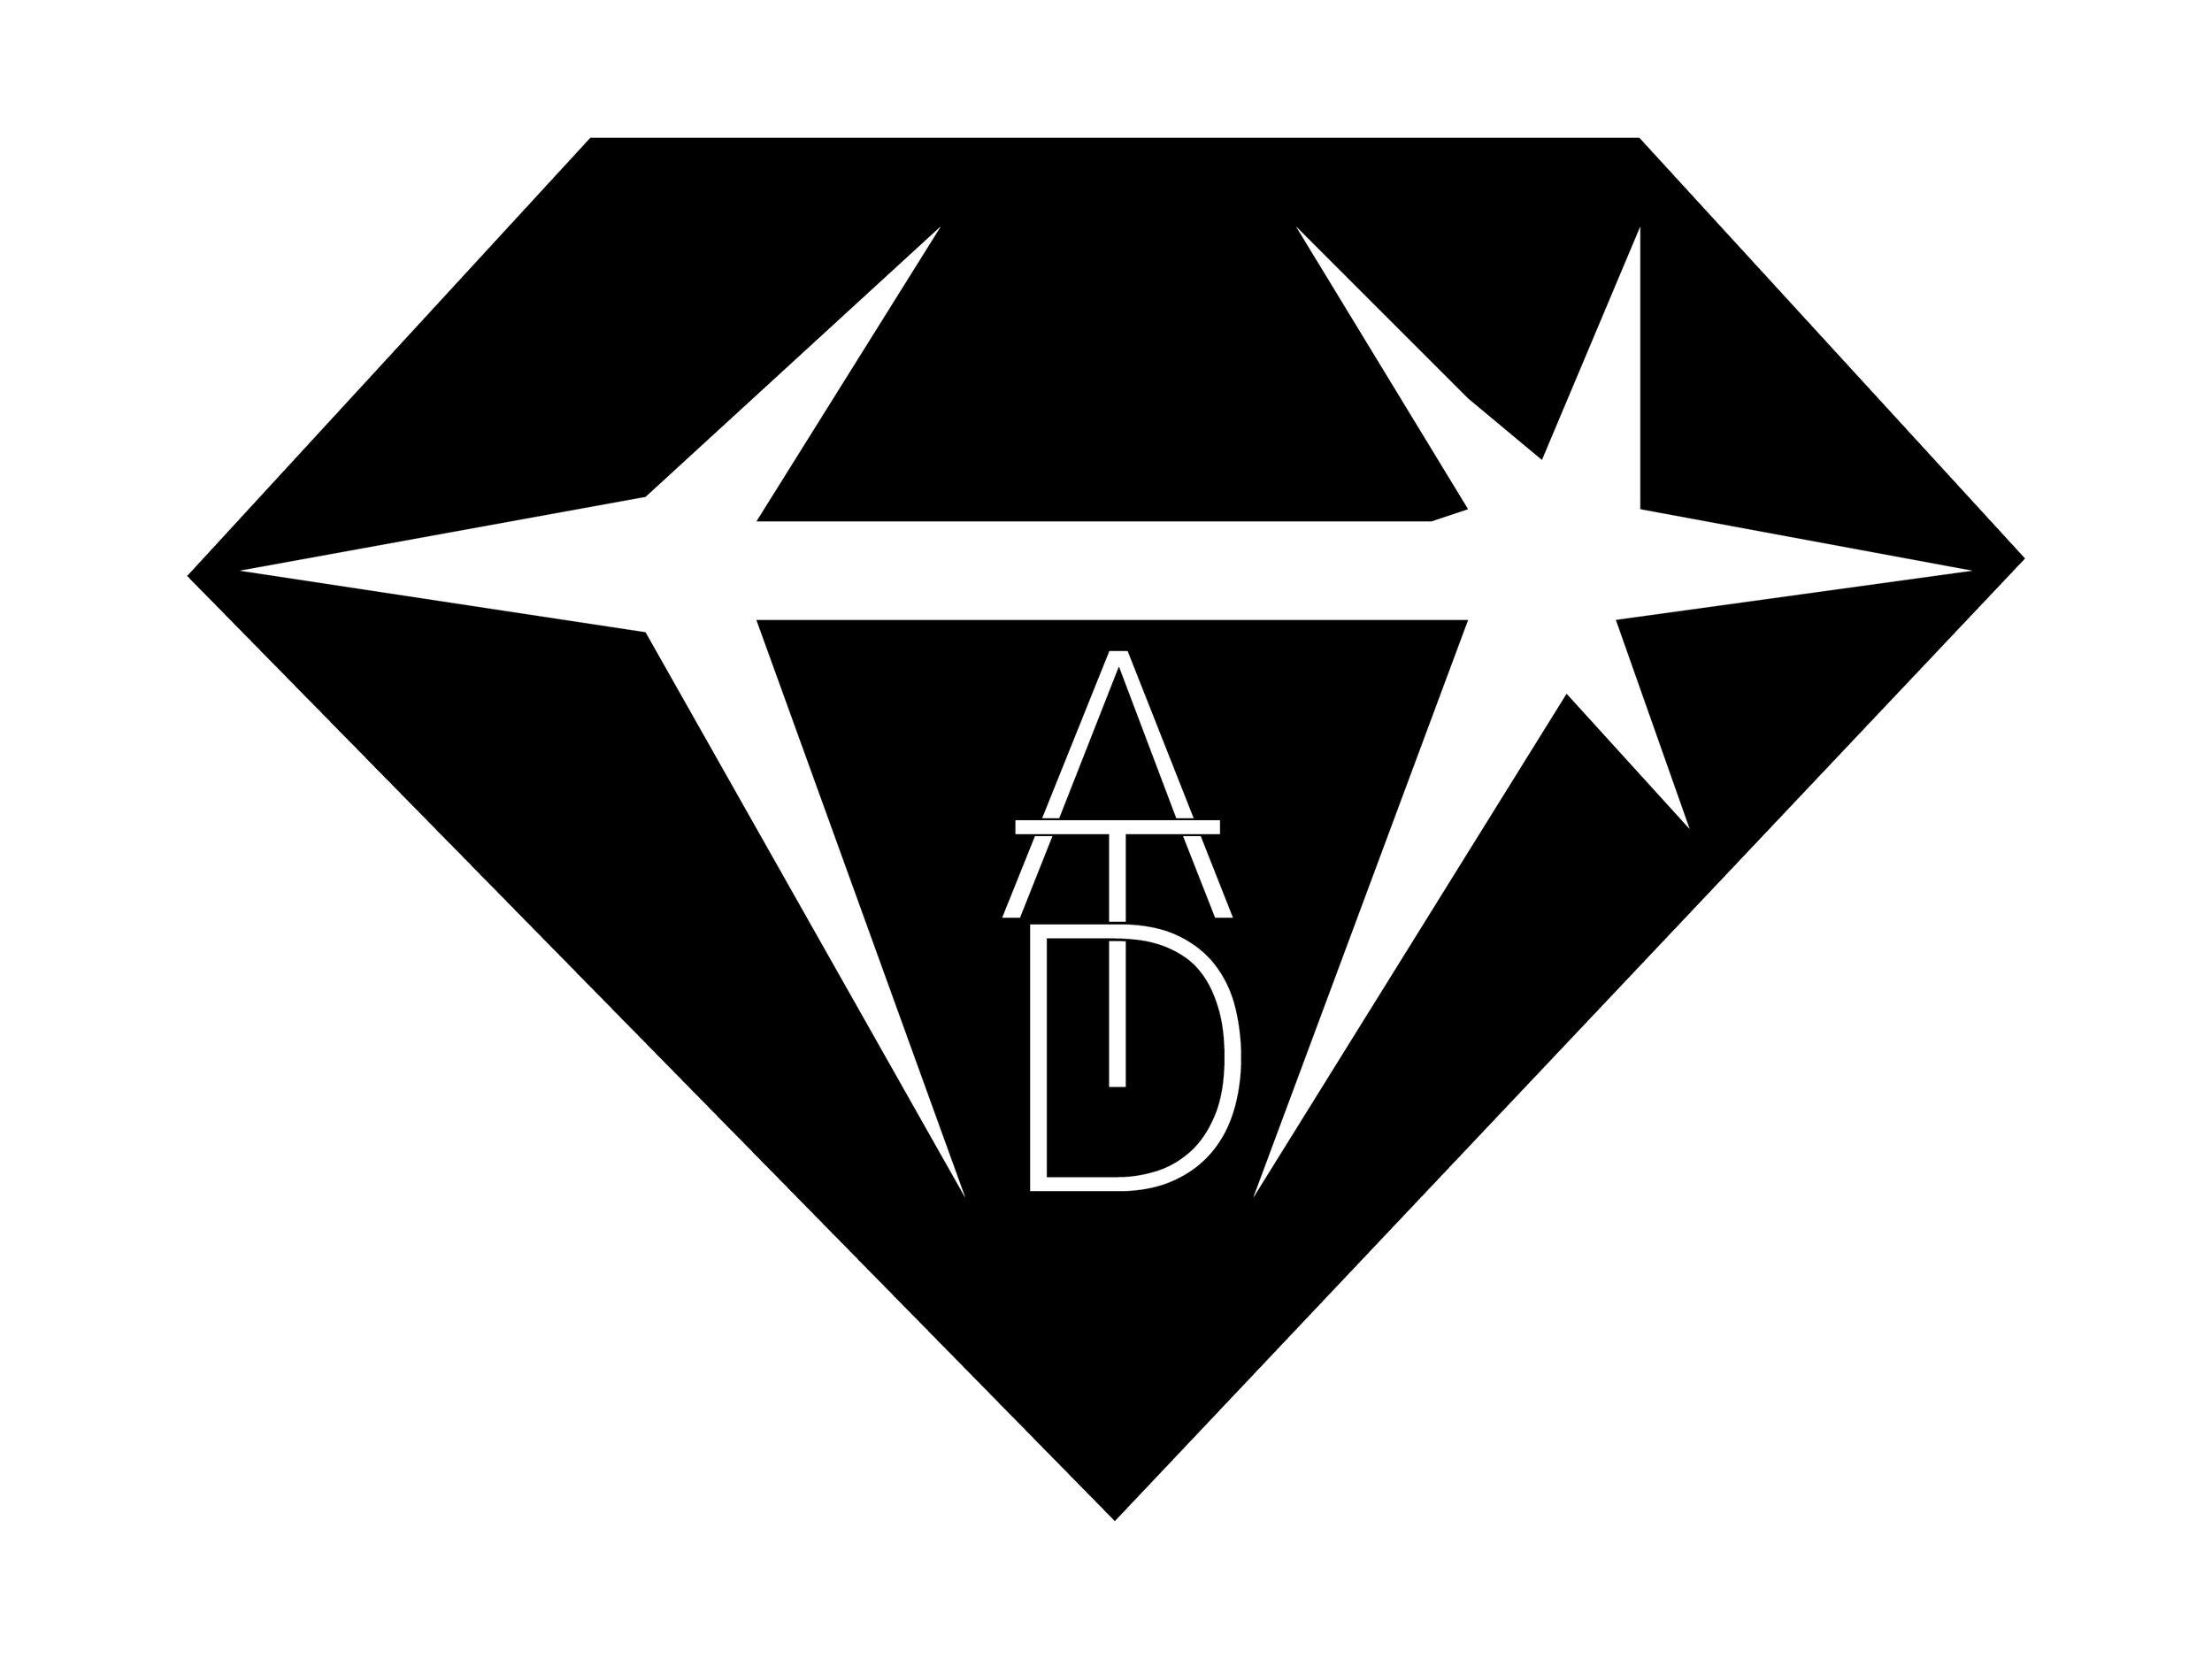 ADONIS - Anne Taylor DueaseGallery 1060, Studio B1060 N. Guillemard St.Pensacola, FL 32501